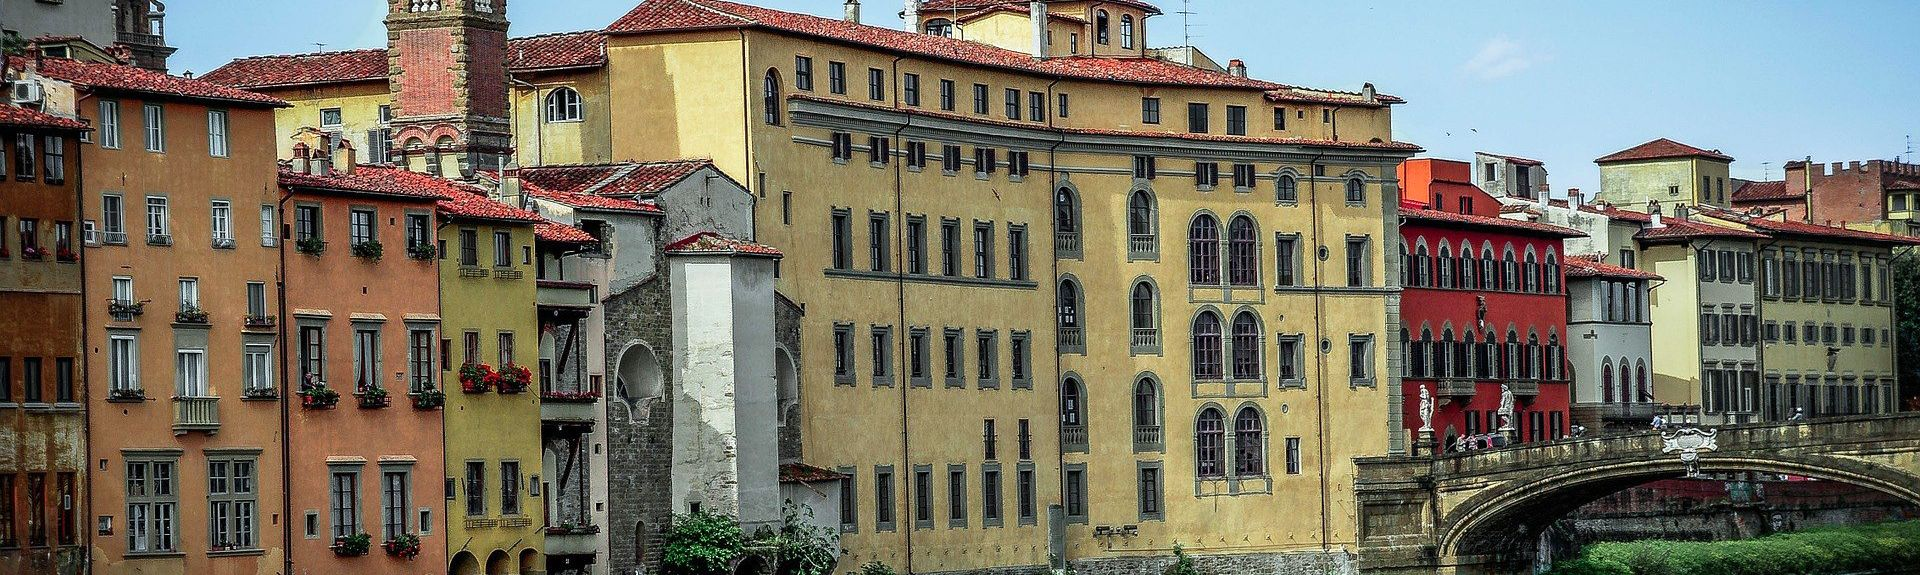 Gavinana, Φλωρεντία, Τοσκάνη, Ιταλία